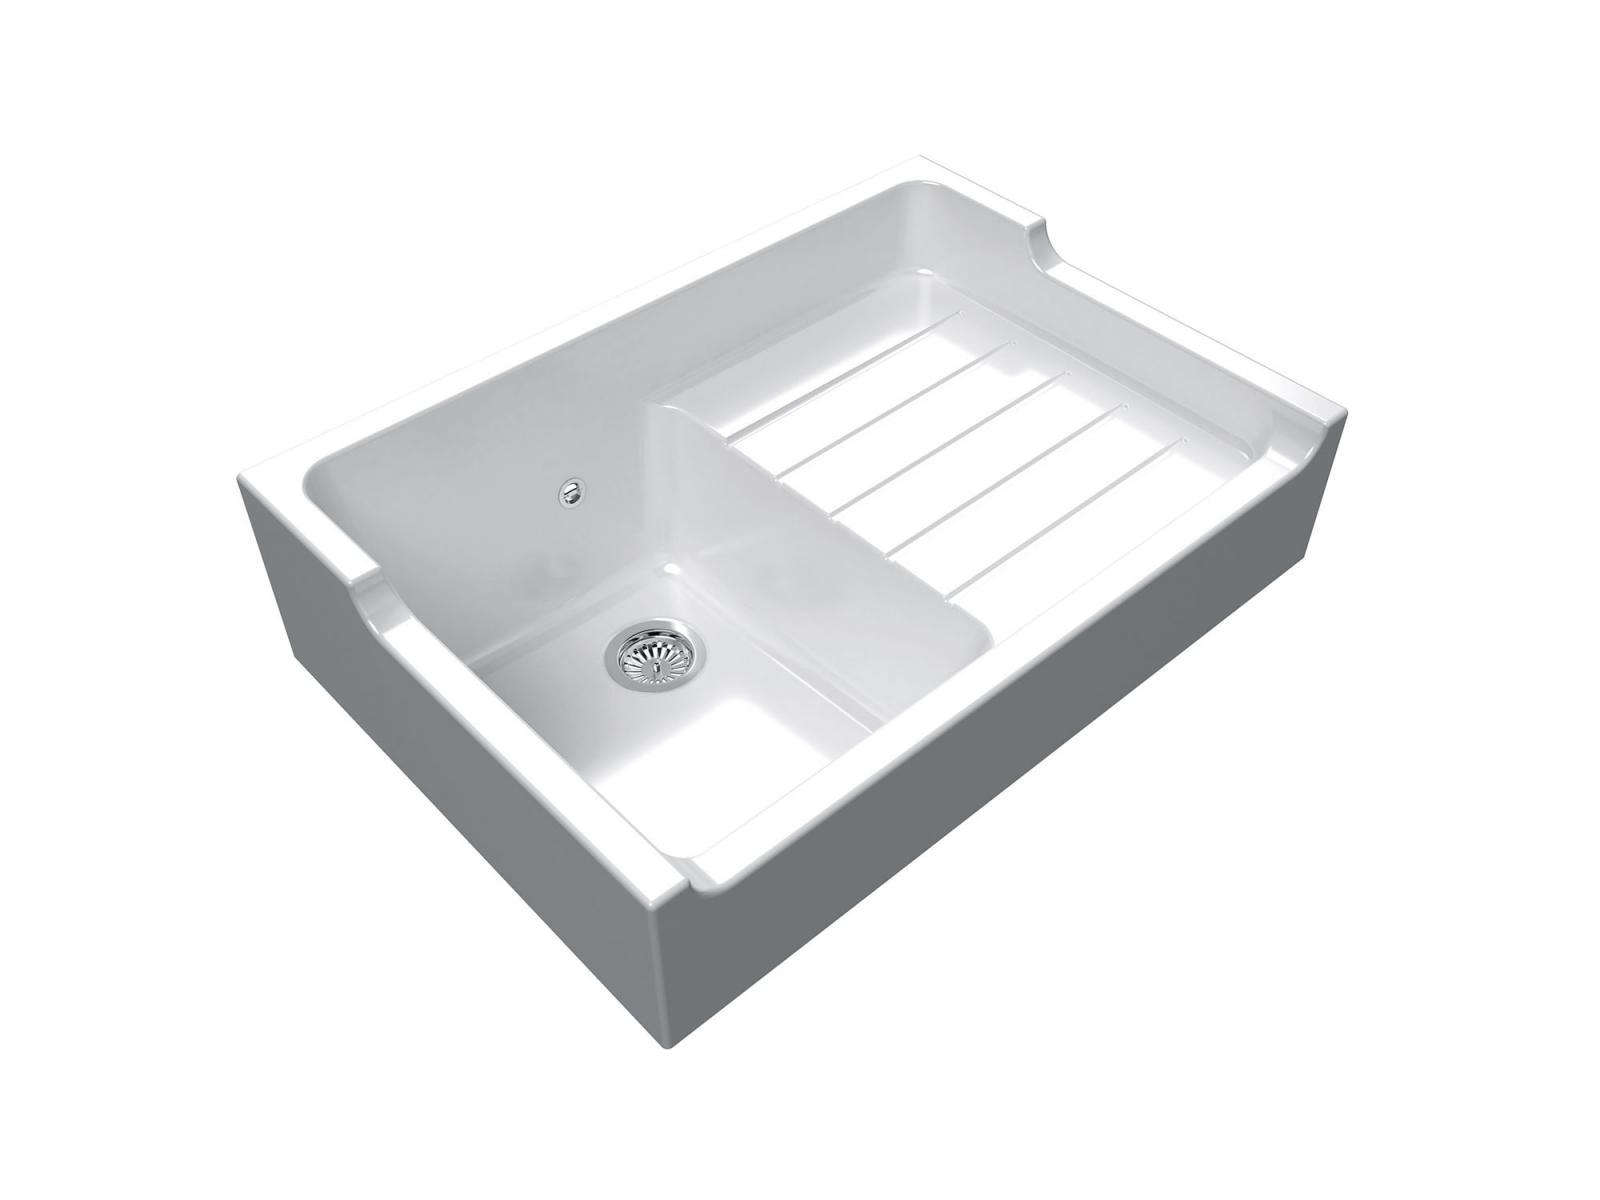 High-quality sink Francois 1 - single bowl, ceramic - ambience 3